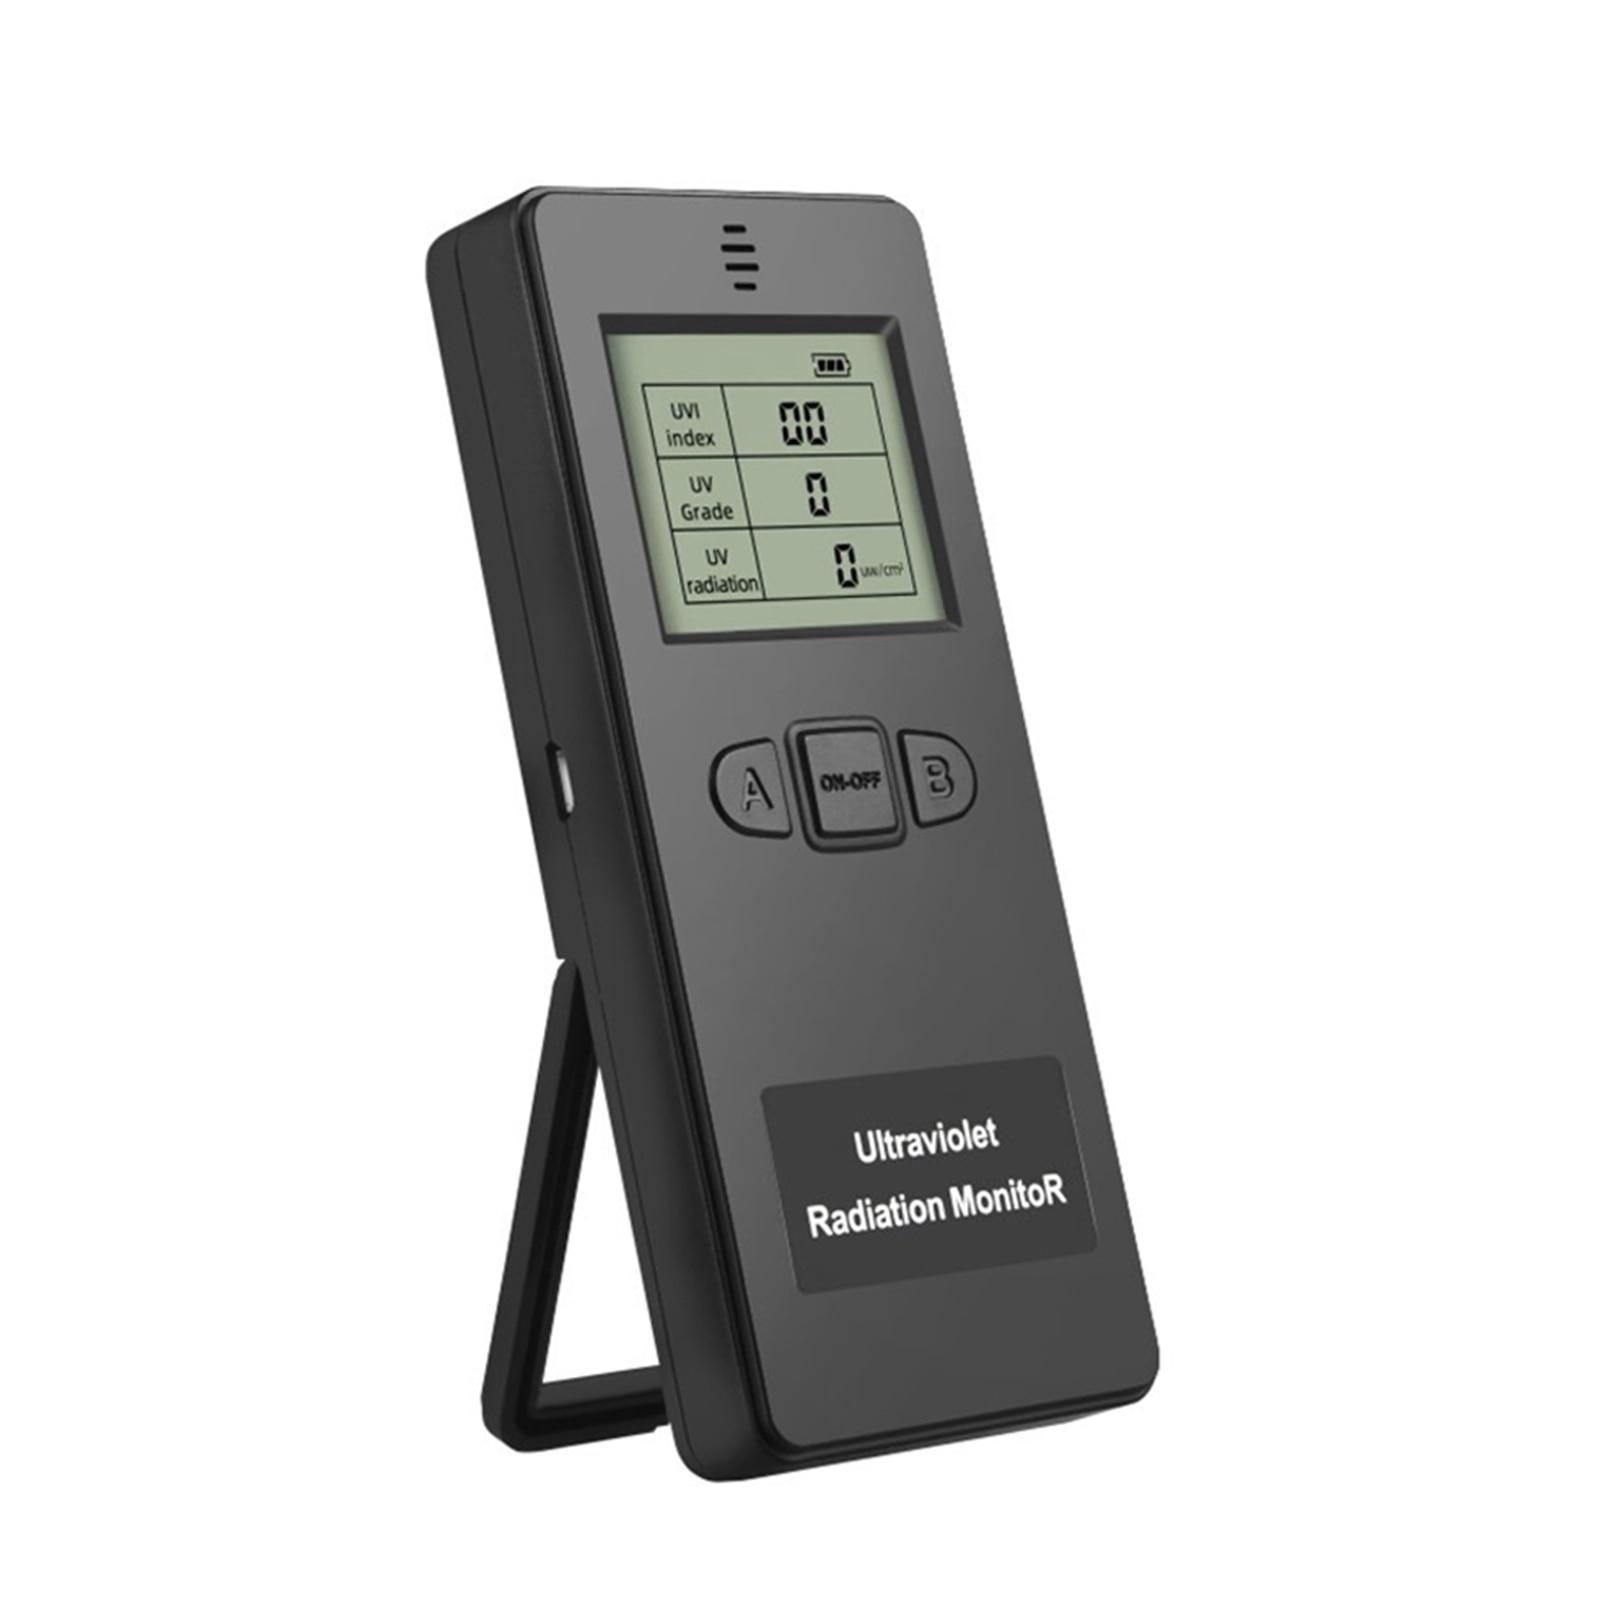 LCD Digital Display Handheld Portable UVI Meter Physical Measuring Instrument Testing Lightweight Ultraviolet Radiation Detector